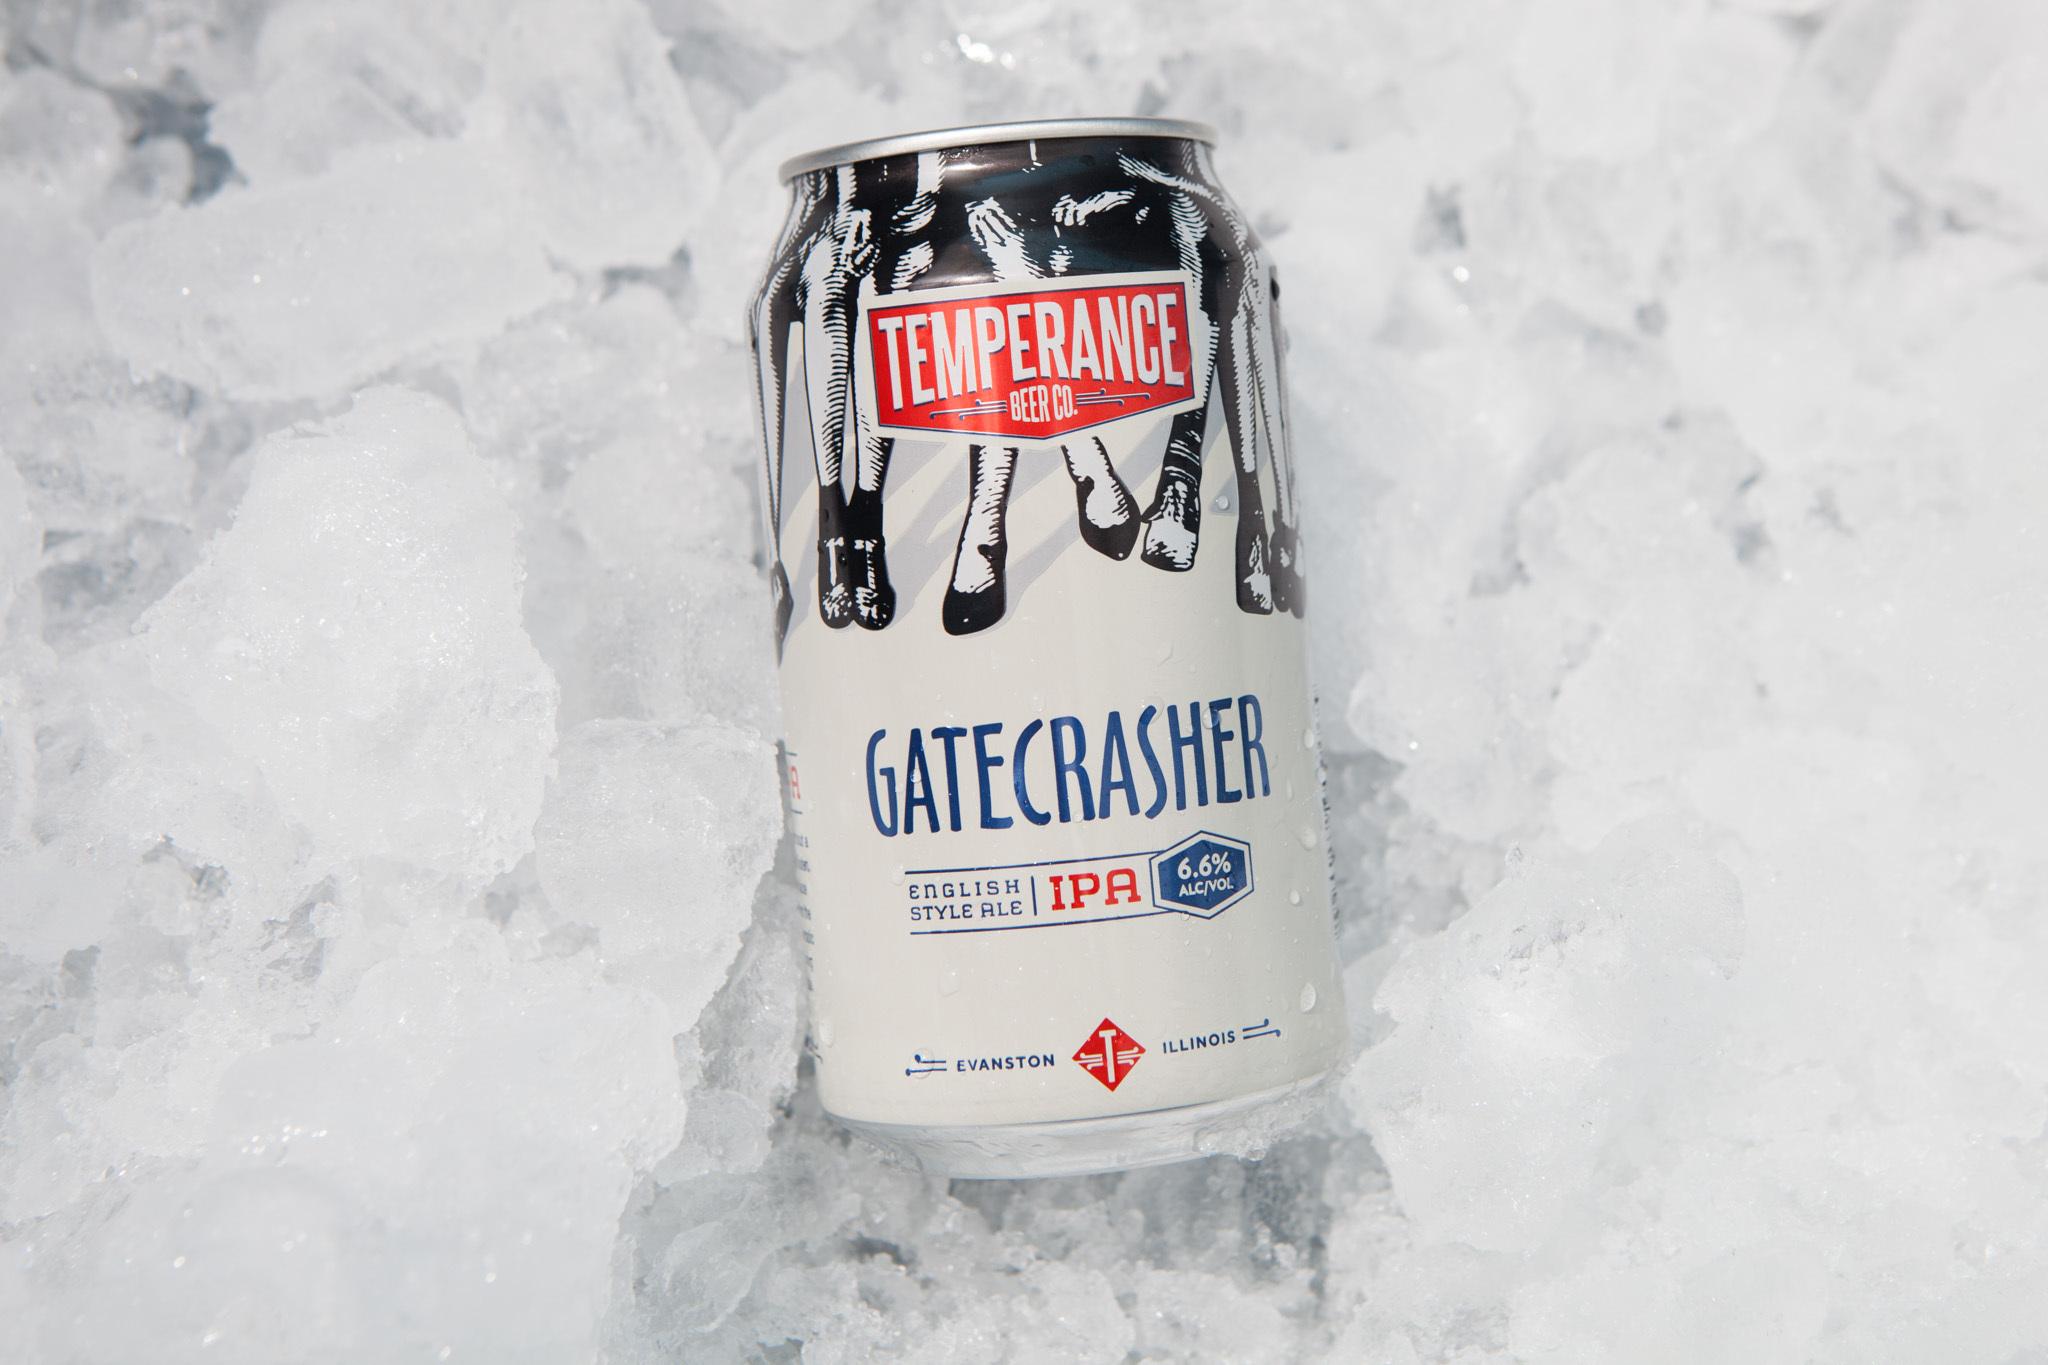 Temperance Brewing's Gatecrasher English IPA